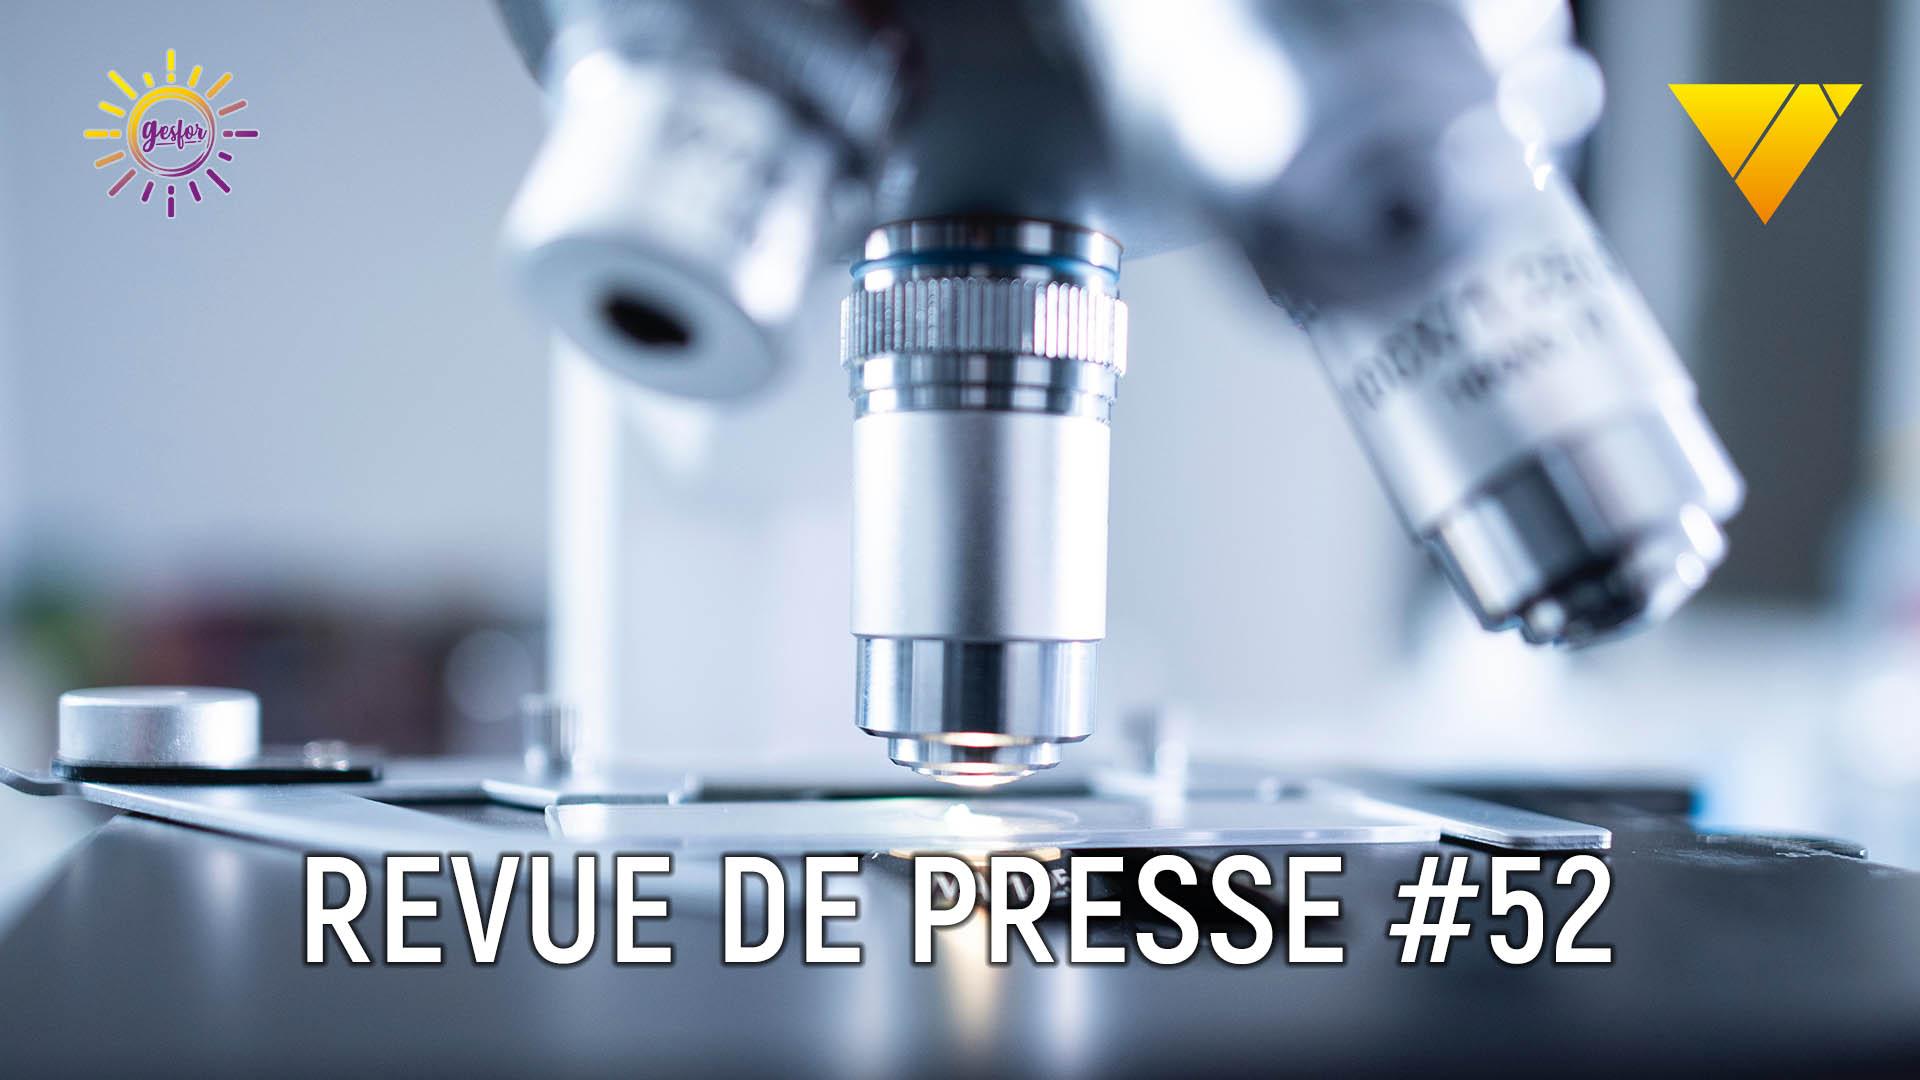 illustration revue de presse numero 51 de mayday formation representant un microscope pour parler de la detection du covid